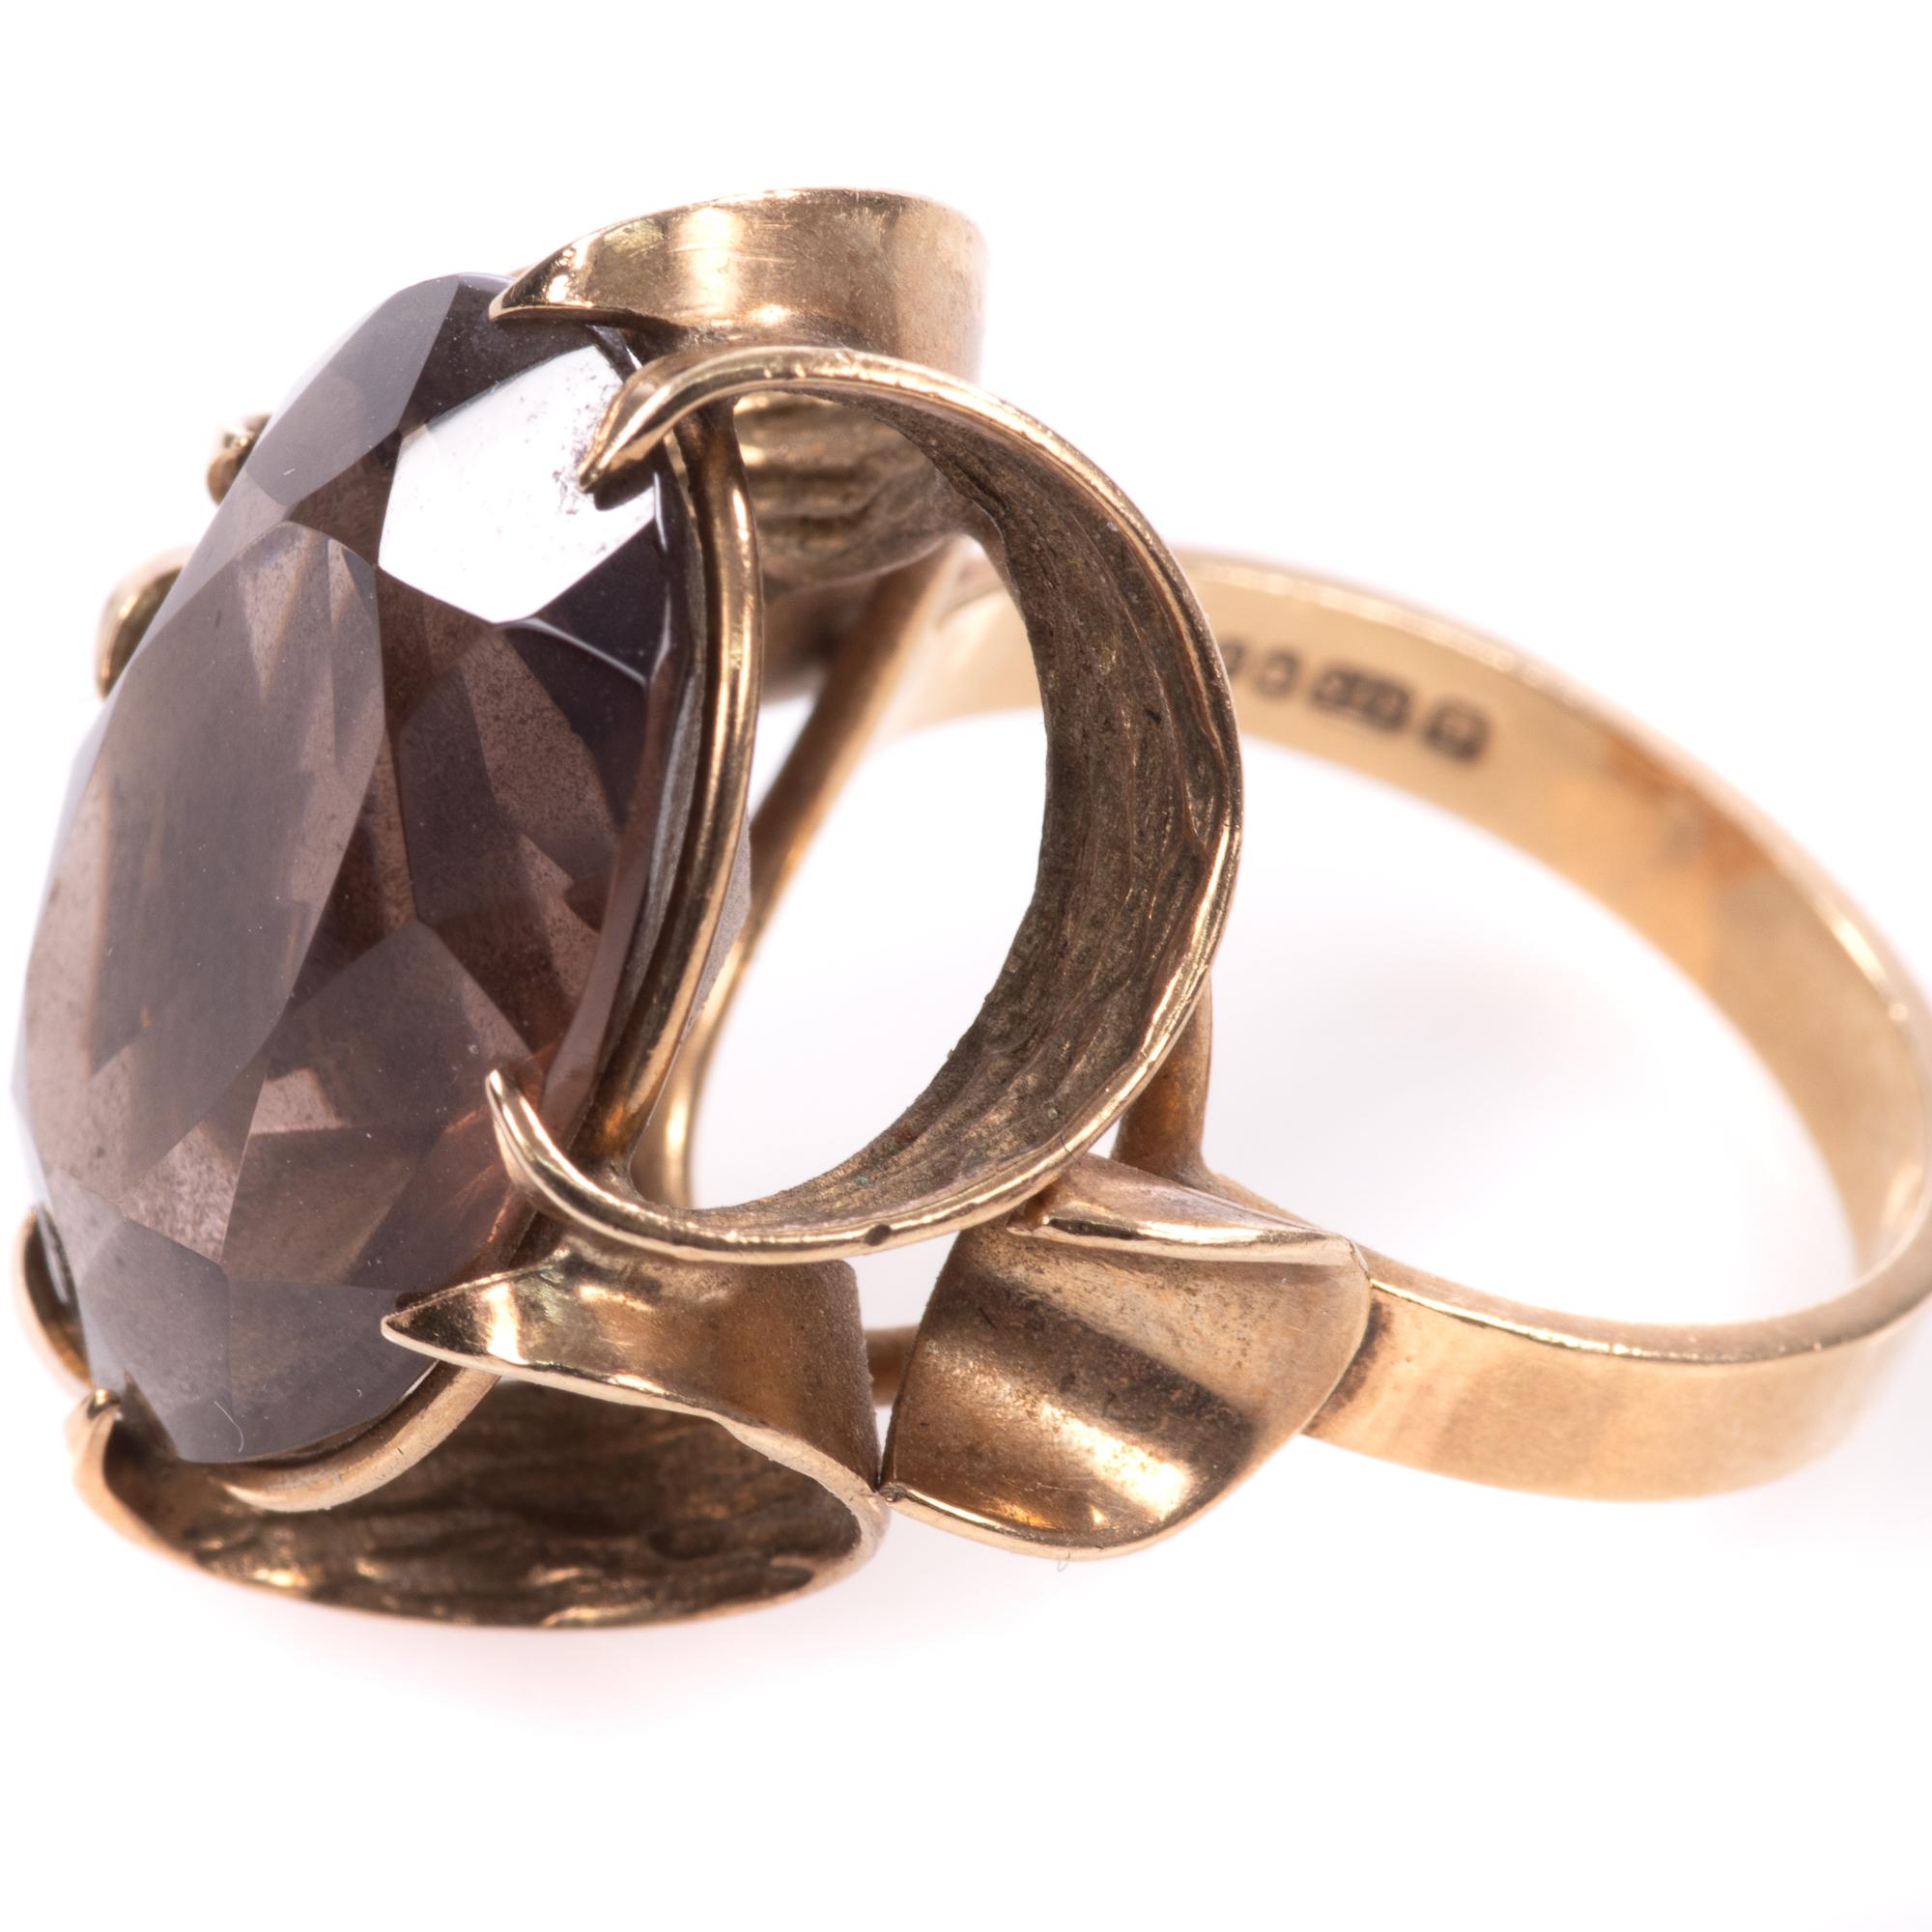 9ct Gold 12.75ct Smoky Quartz Ring - Image 4 of 7